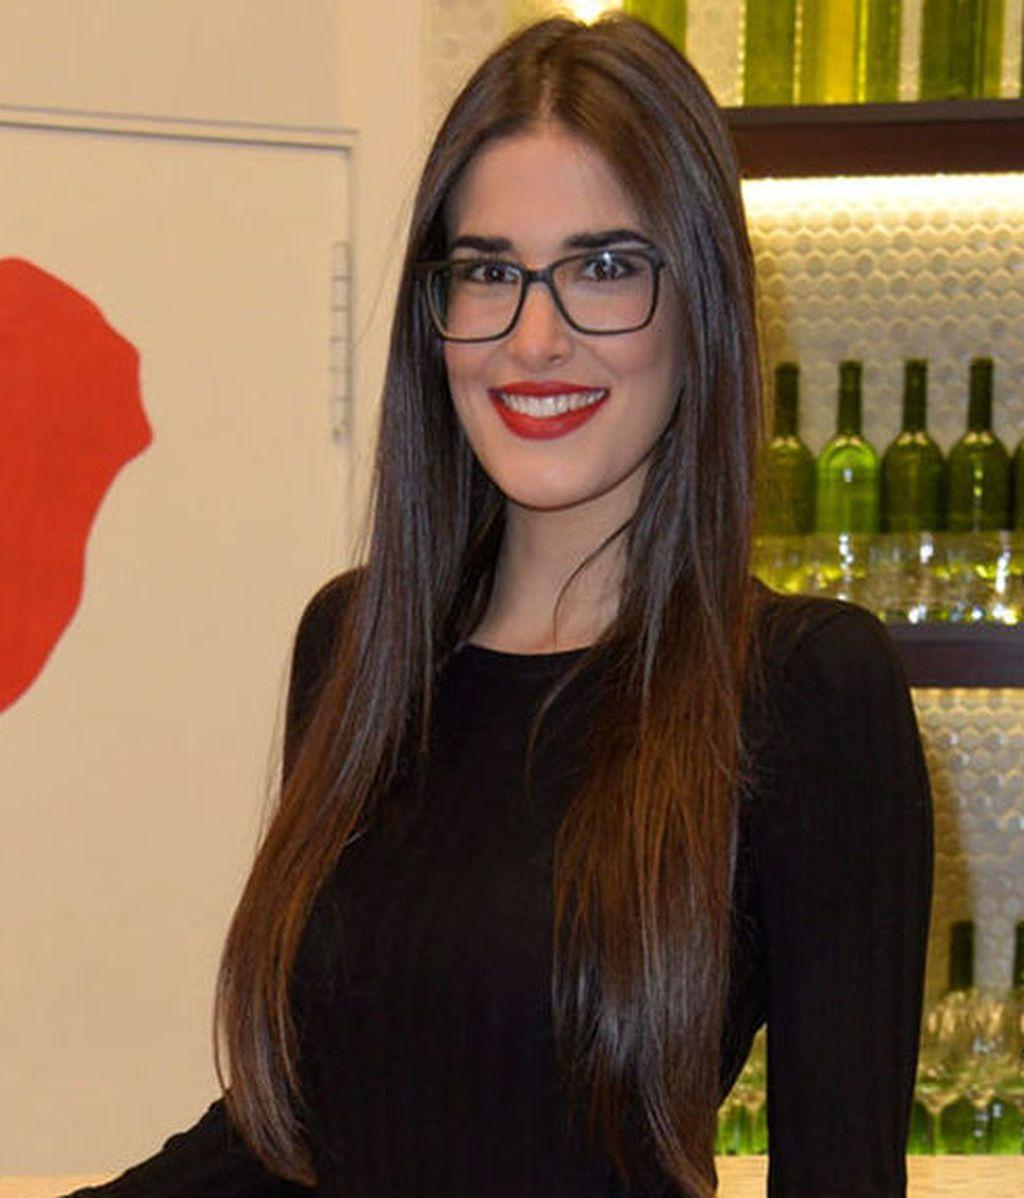 Lidia Torrent